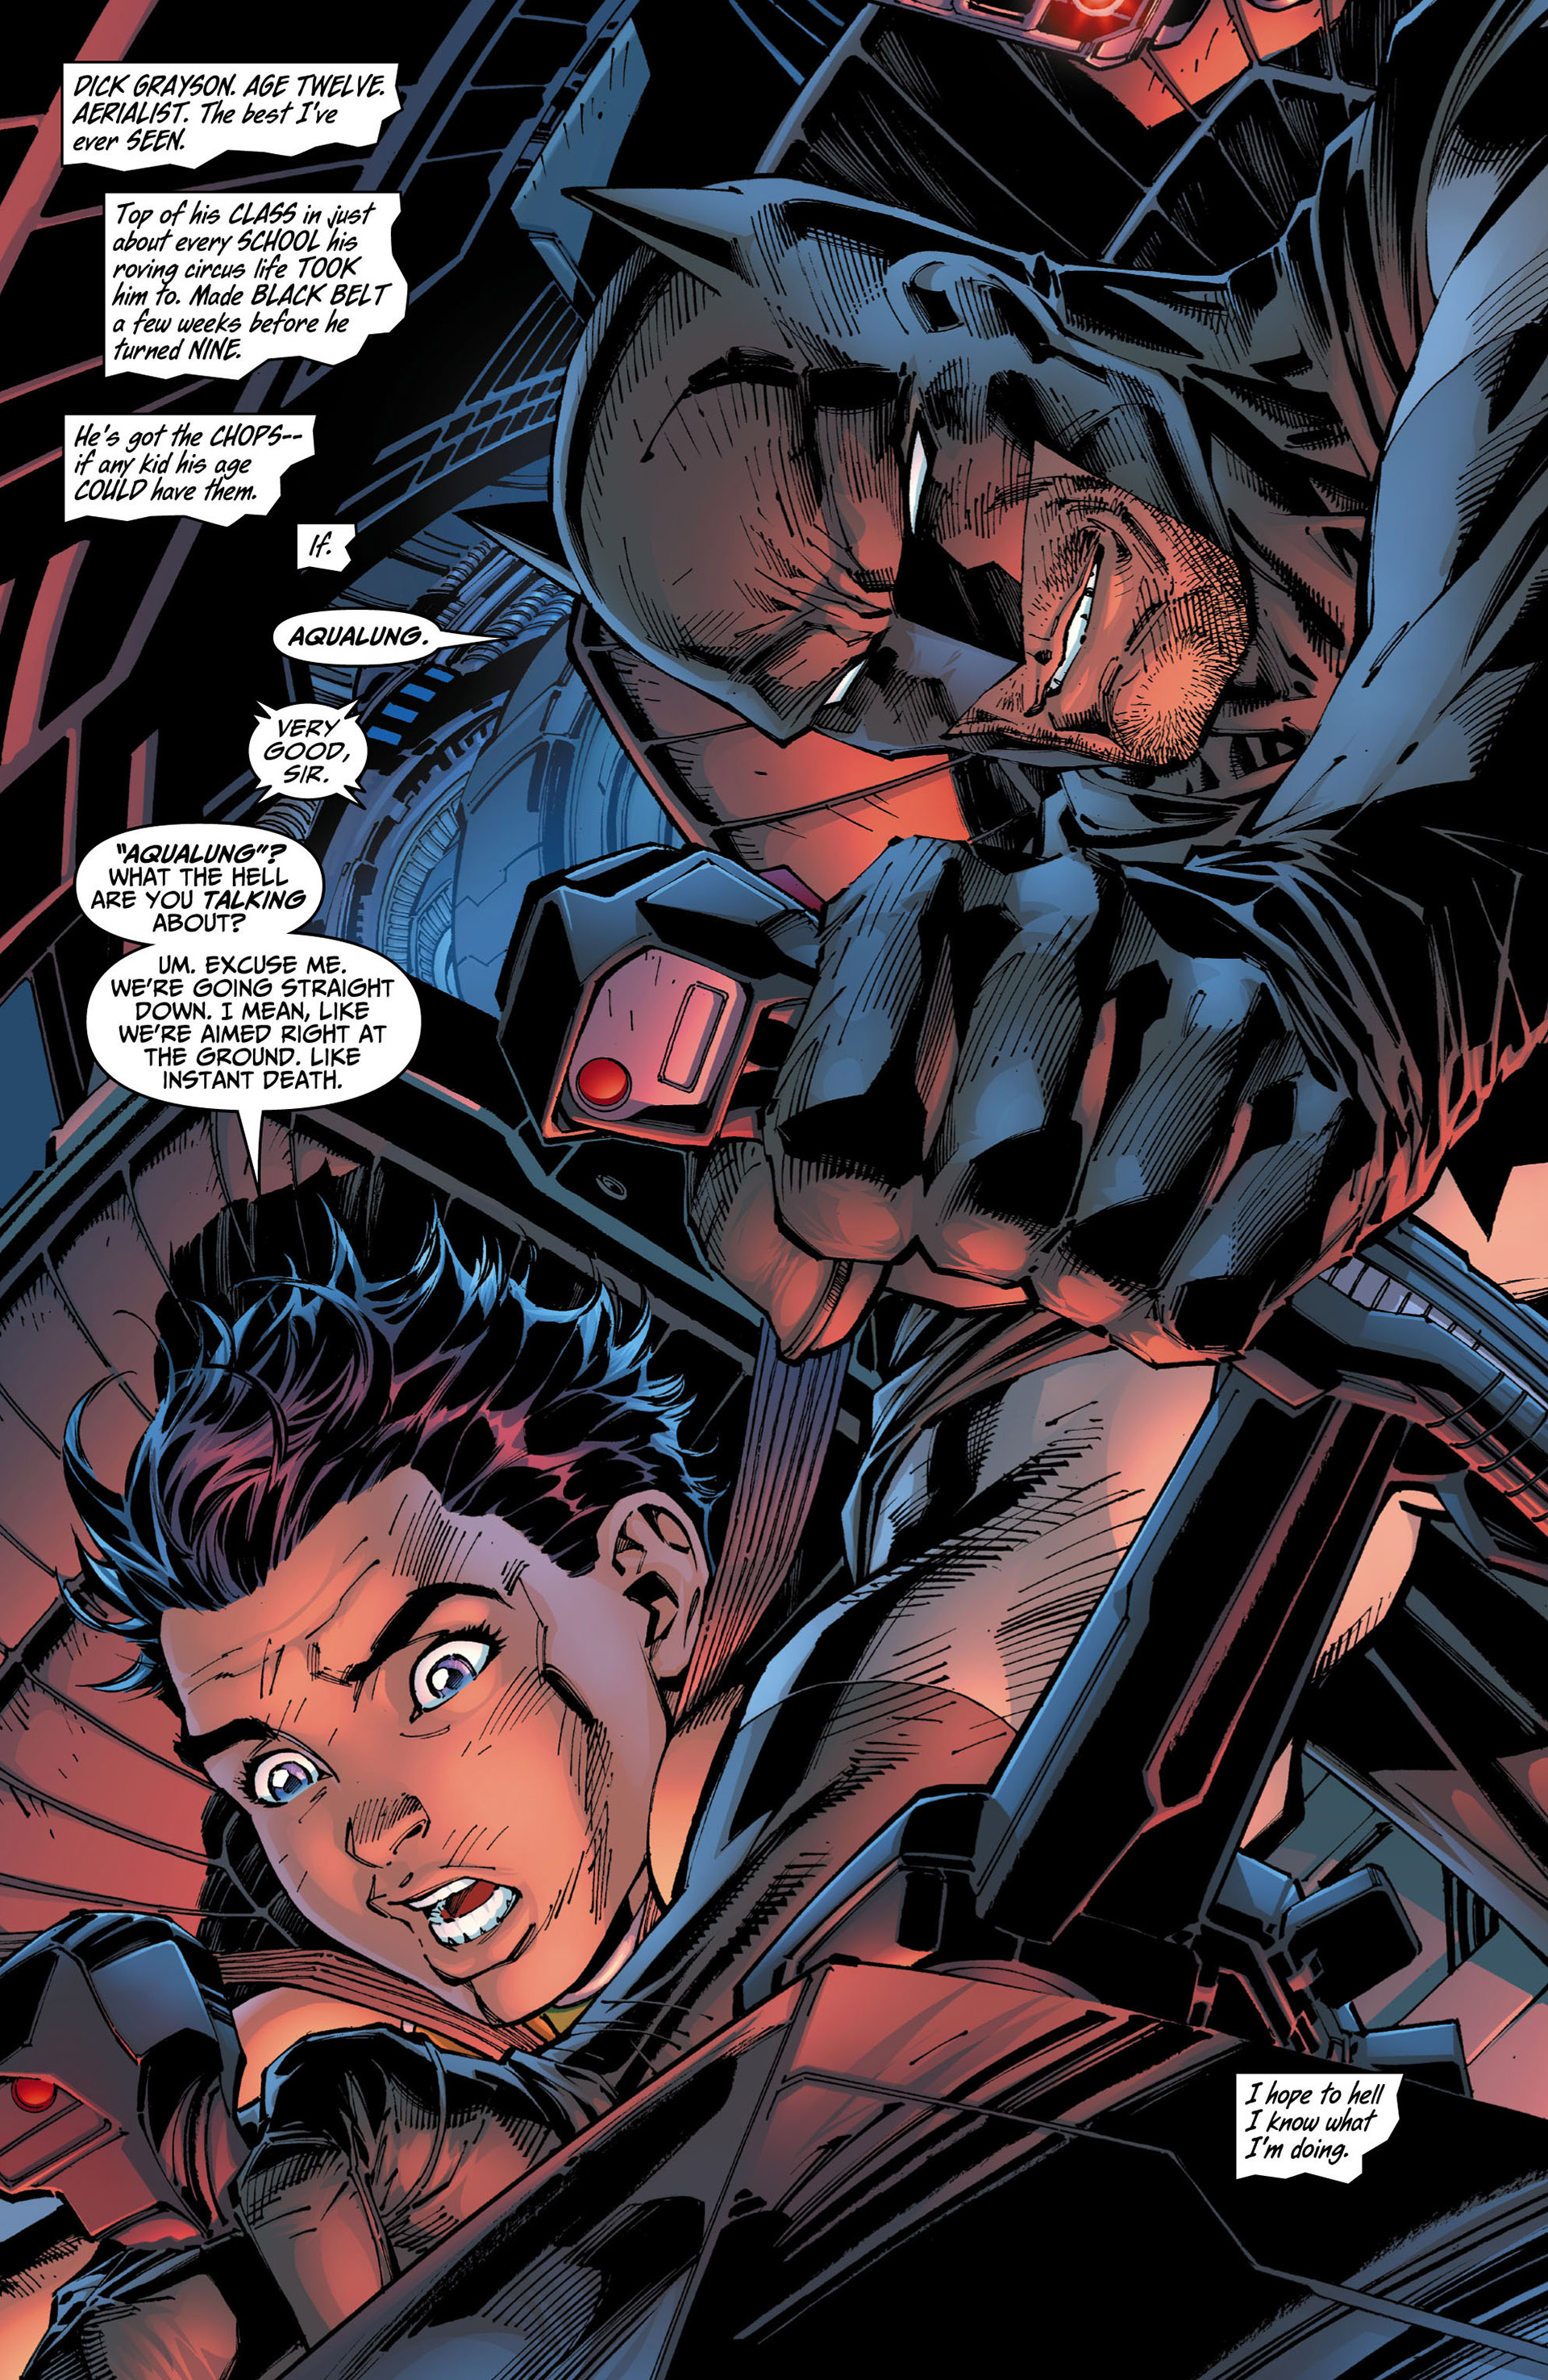 Read online All Star Batman & Robin, The Boy Wonder comic -  Issue #3 - 17